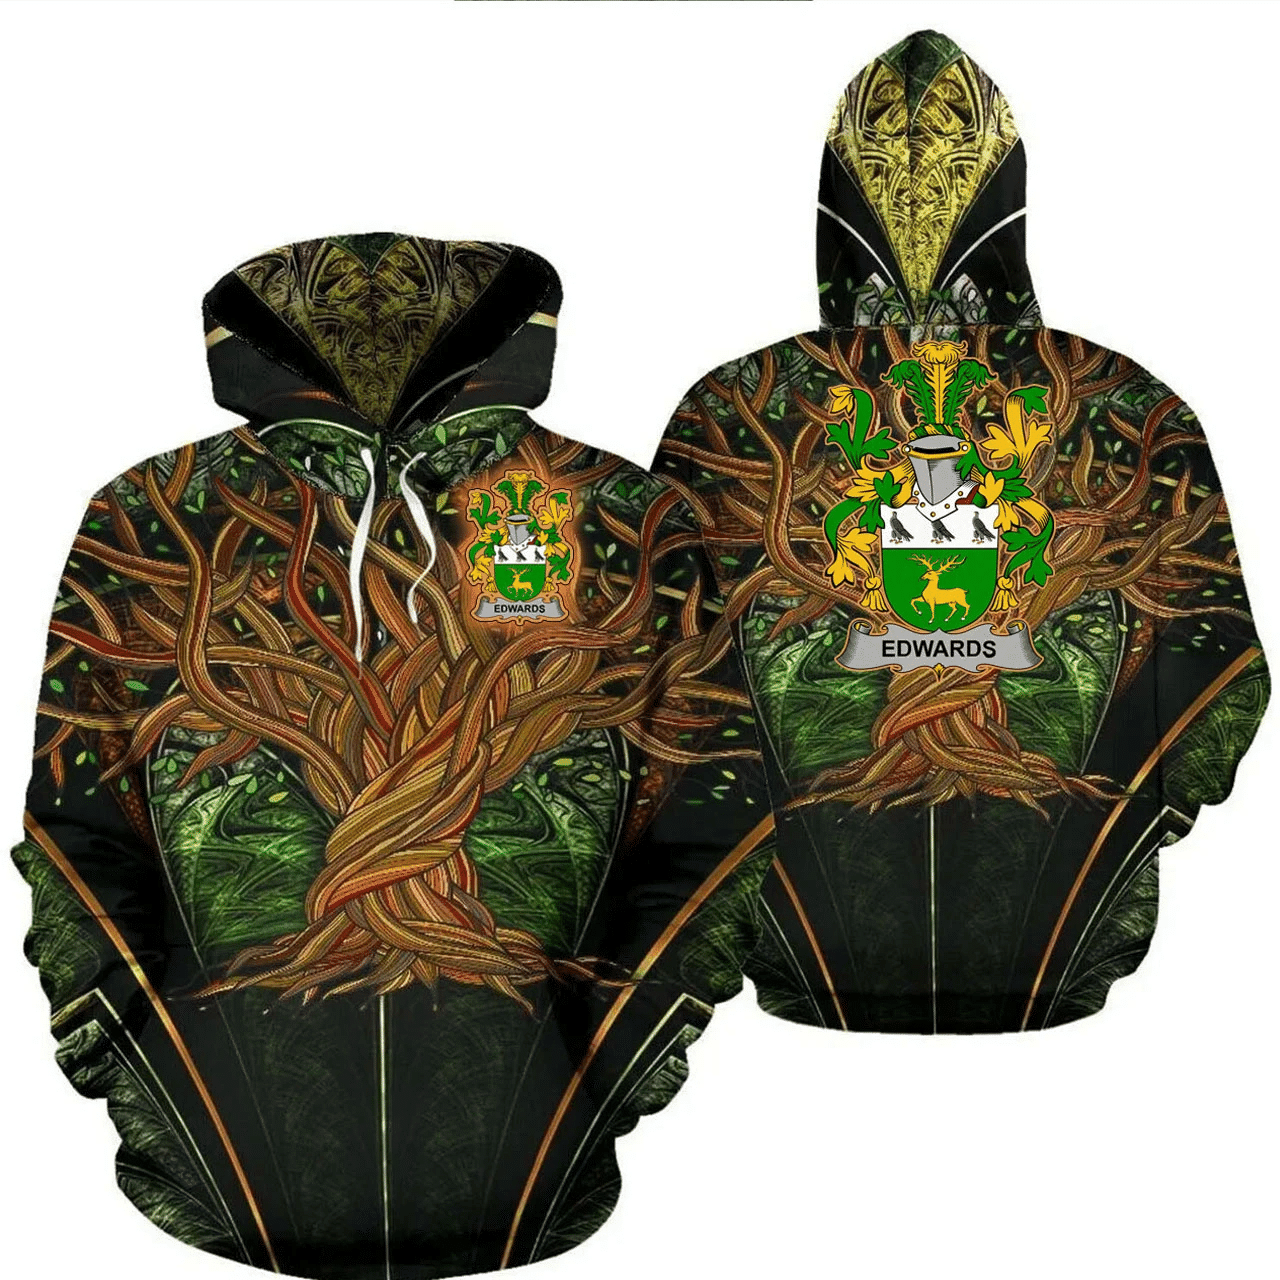 1stIreland Ireland Hoodie - Edwards Irish Family Crest Hoodie - Tree Of Life A7